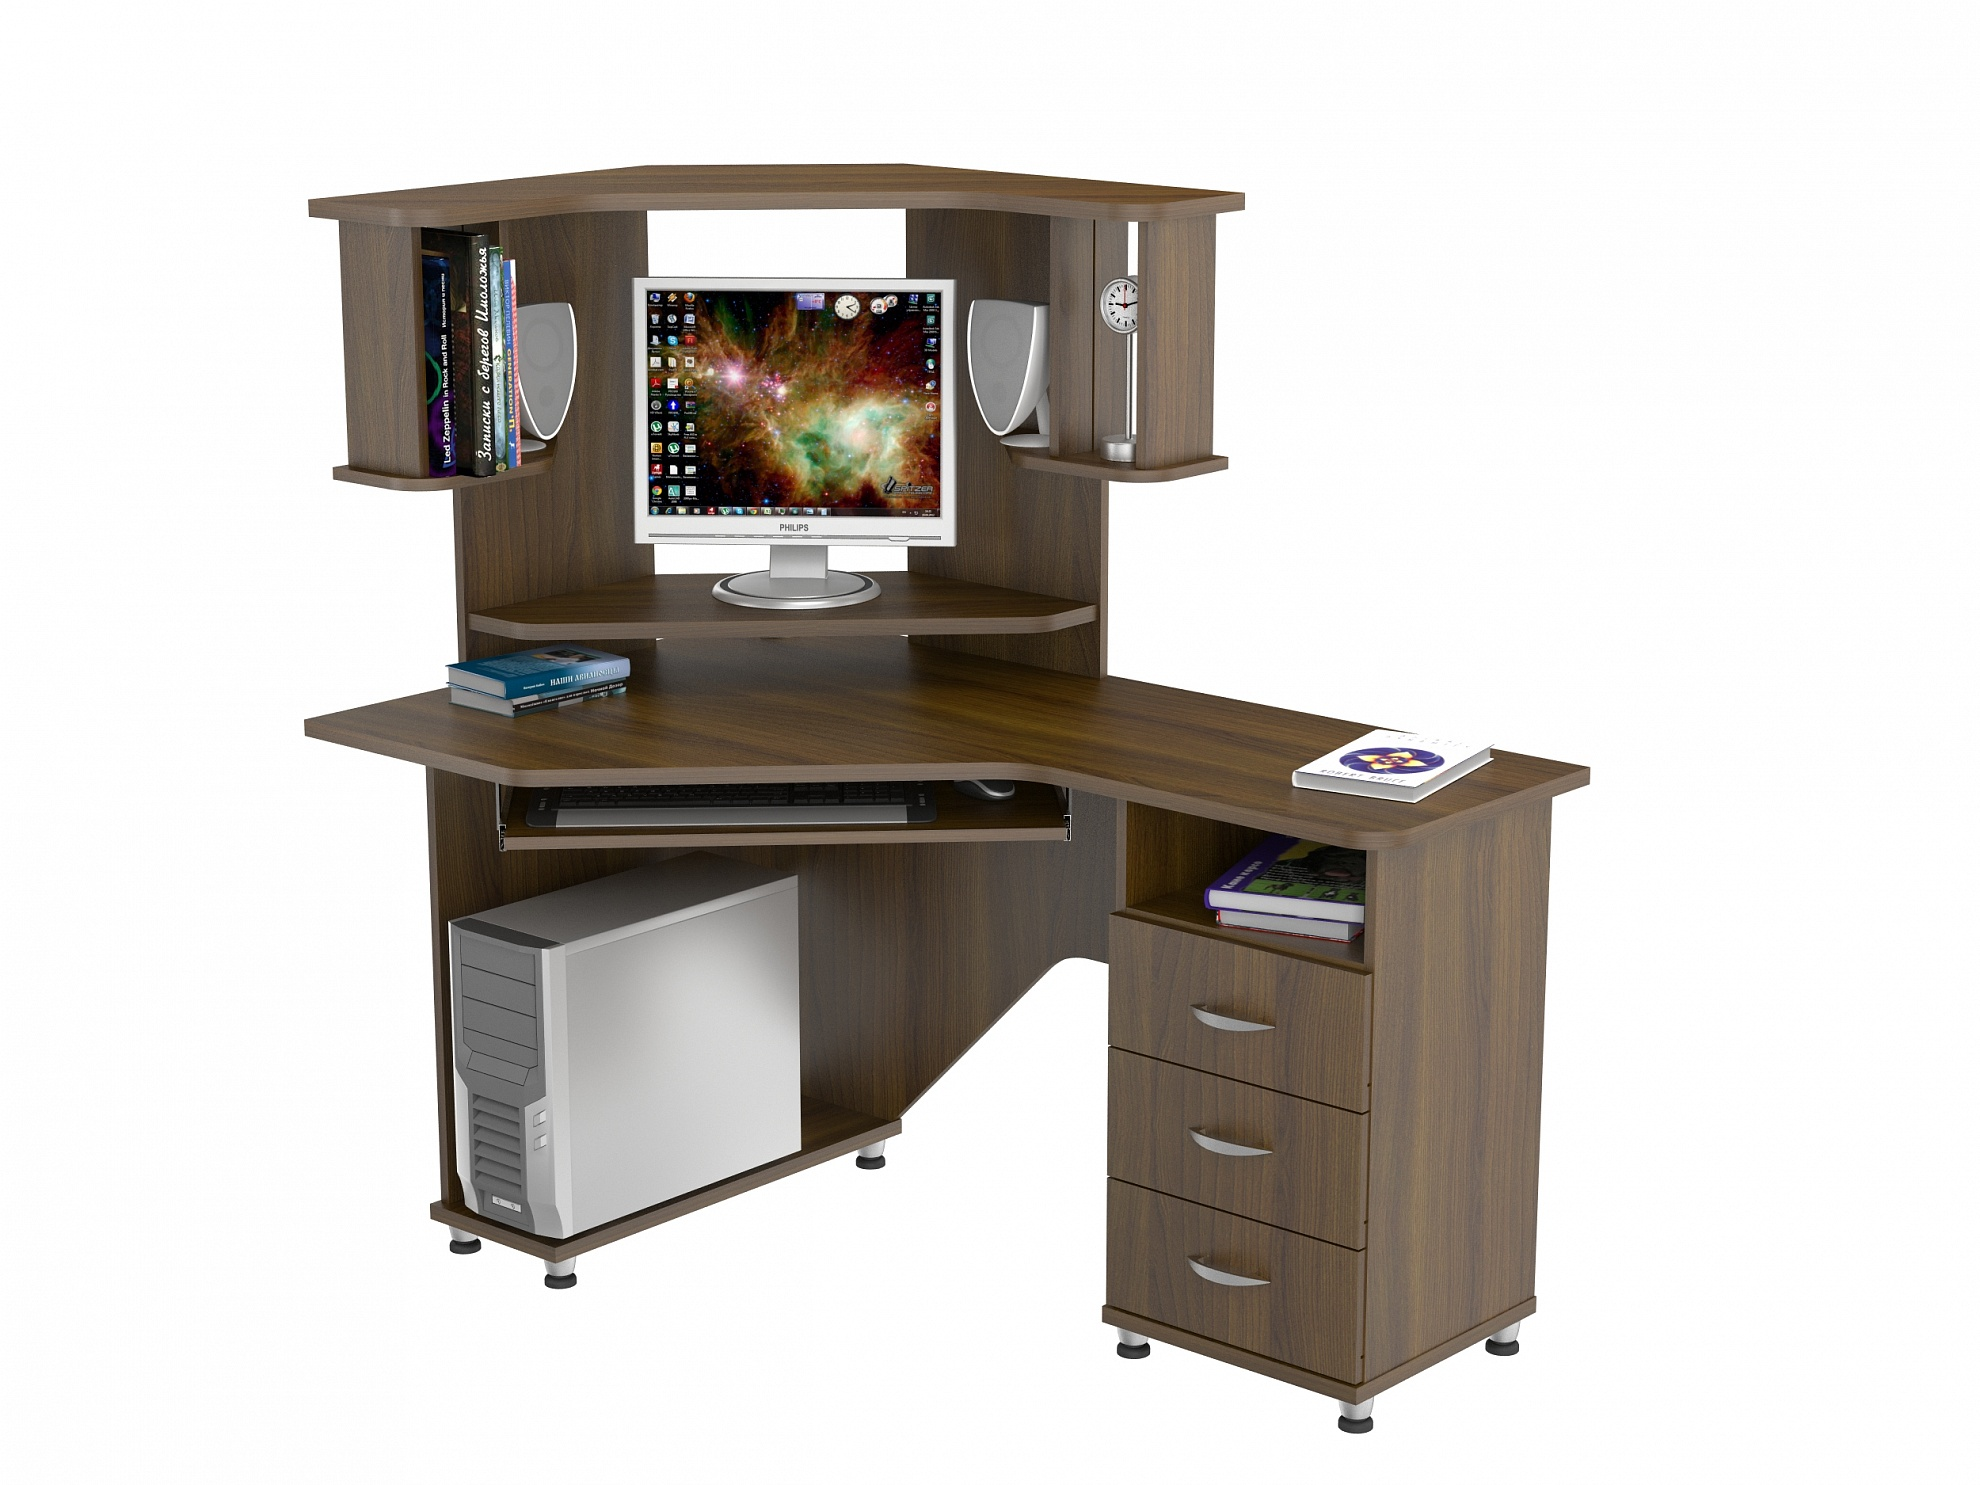 Компьютерный стол КС 20-17м2 компьютерный стол кс 20 16м3